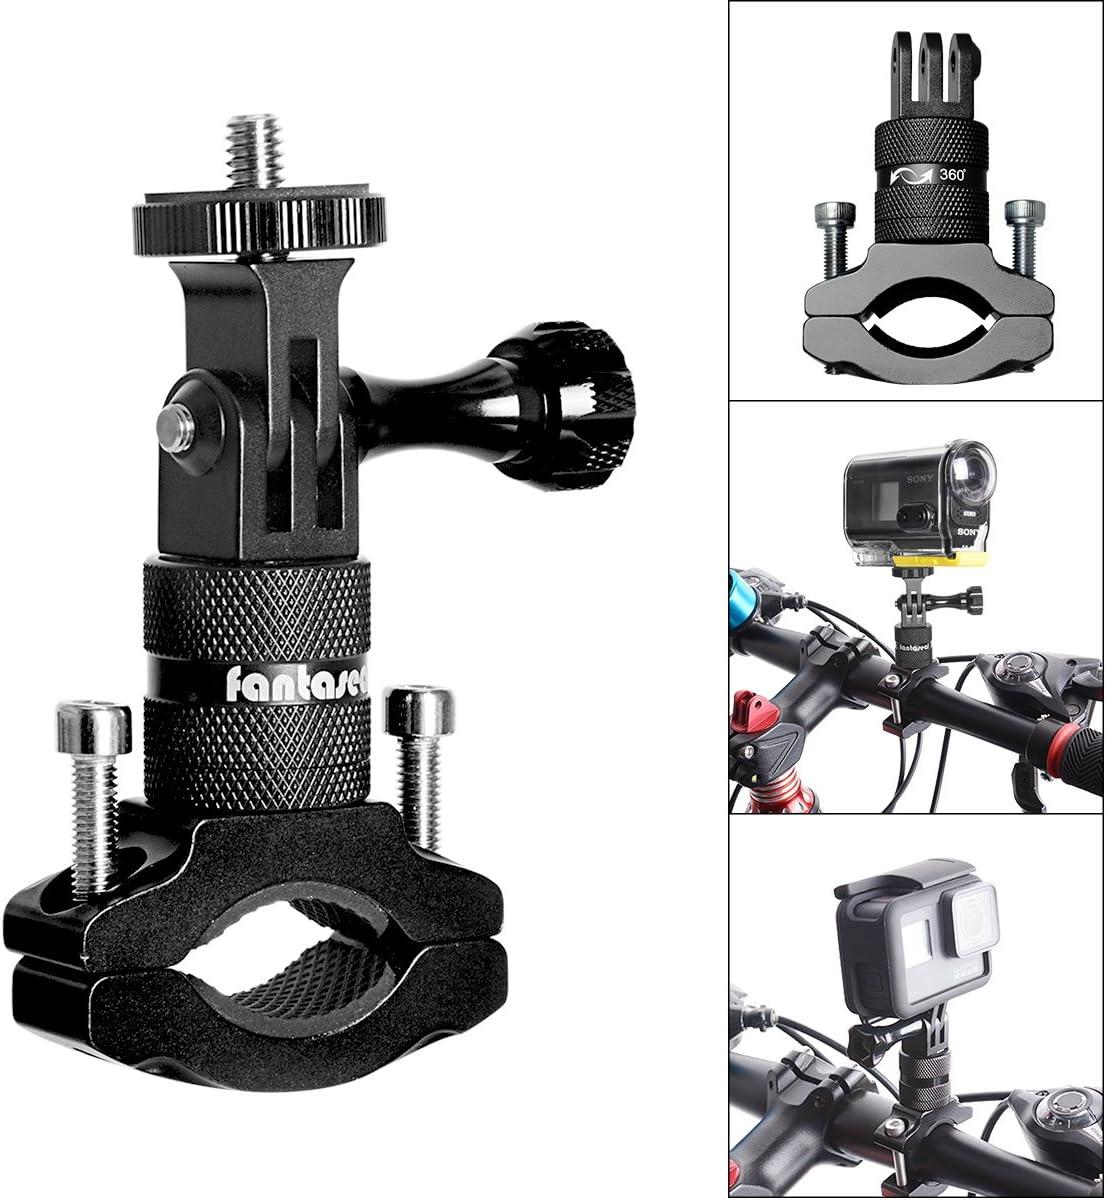 Soporte de cámara de acción para bicicleta, adaptador de manillar de aluminio giratorio de 360 grados para GoPro Hero 7/6/5/4/3+/3 Sony Action Cam y otros soportes de cámara deportiva para bicicleta